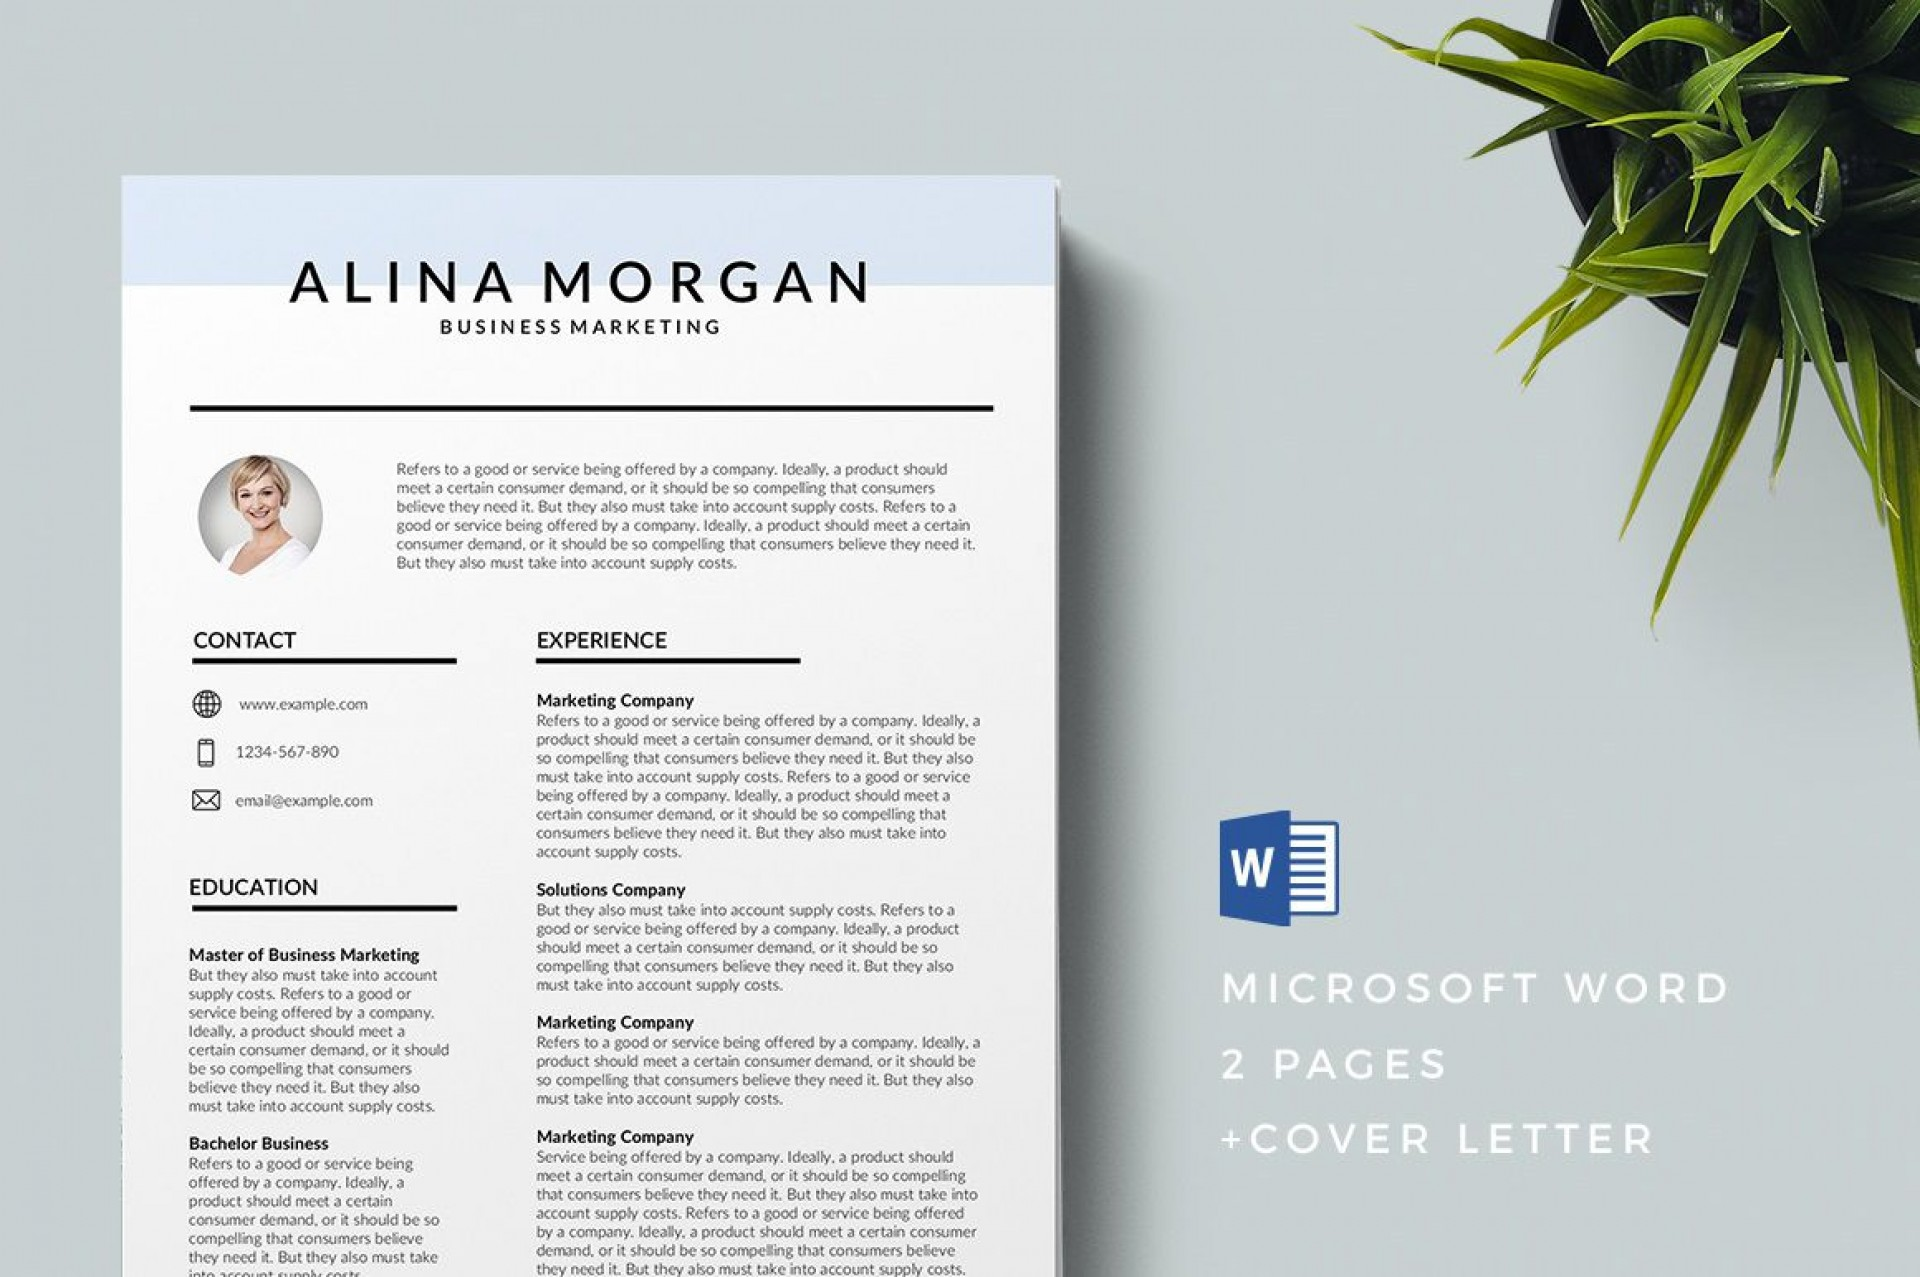 006 Stirring Free Printable Resume Template 2019 Concept 1920